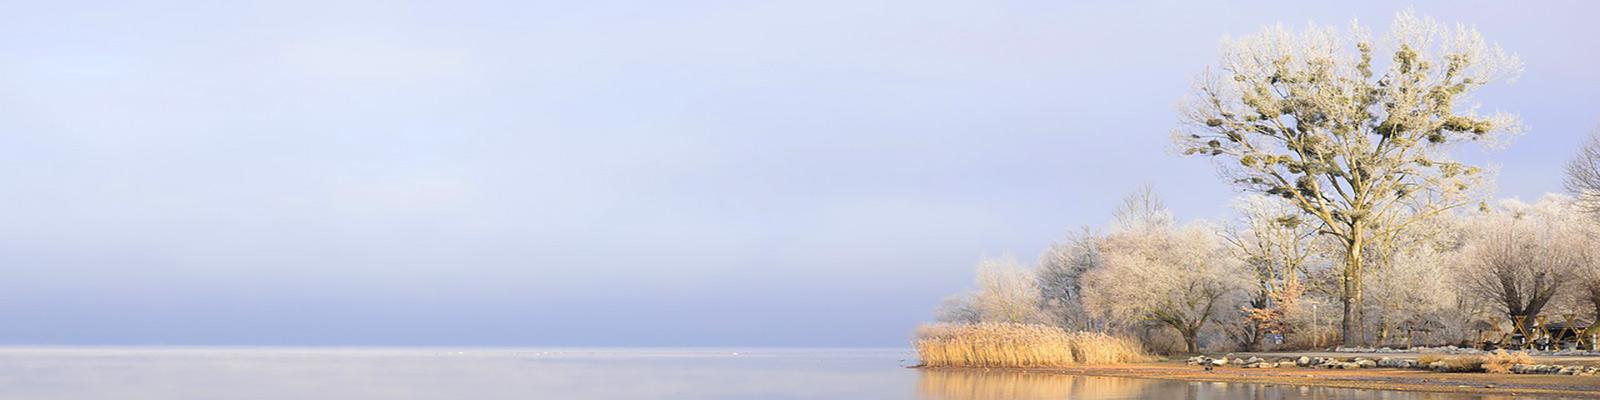 slider winter 5